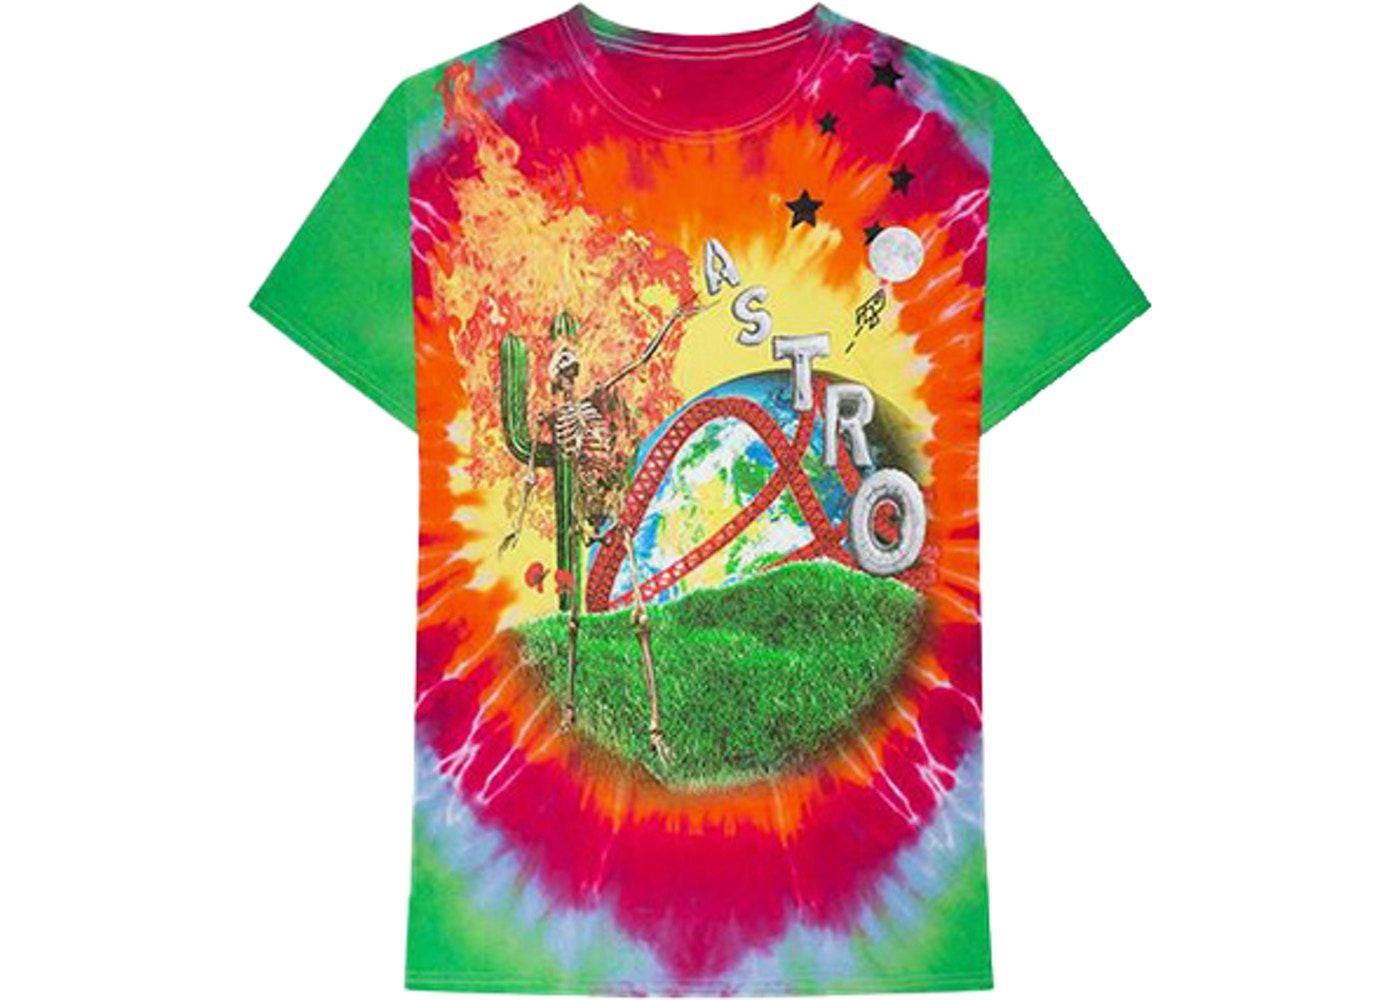 Travis Scott Astroworld Smiley Tee Multi Tie Dye Smiley Travis Scott Astroworld Tie Dye [ 1000 x 1400 Pixel ]